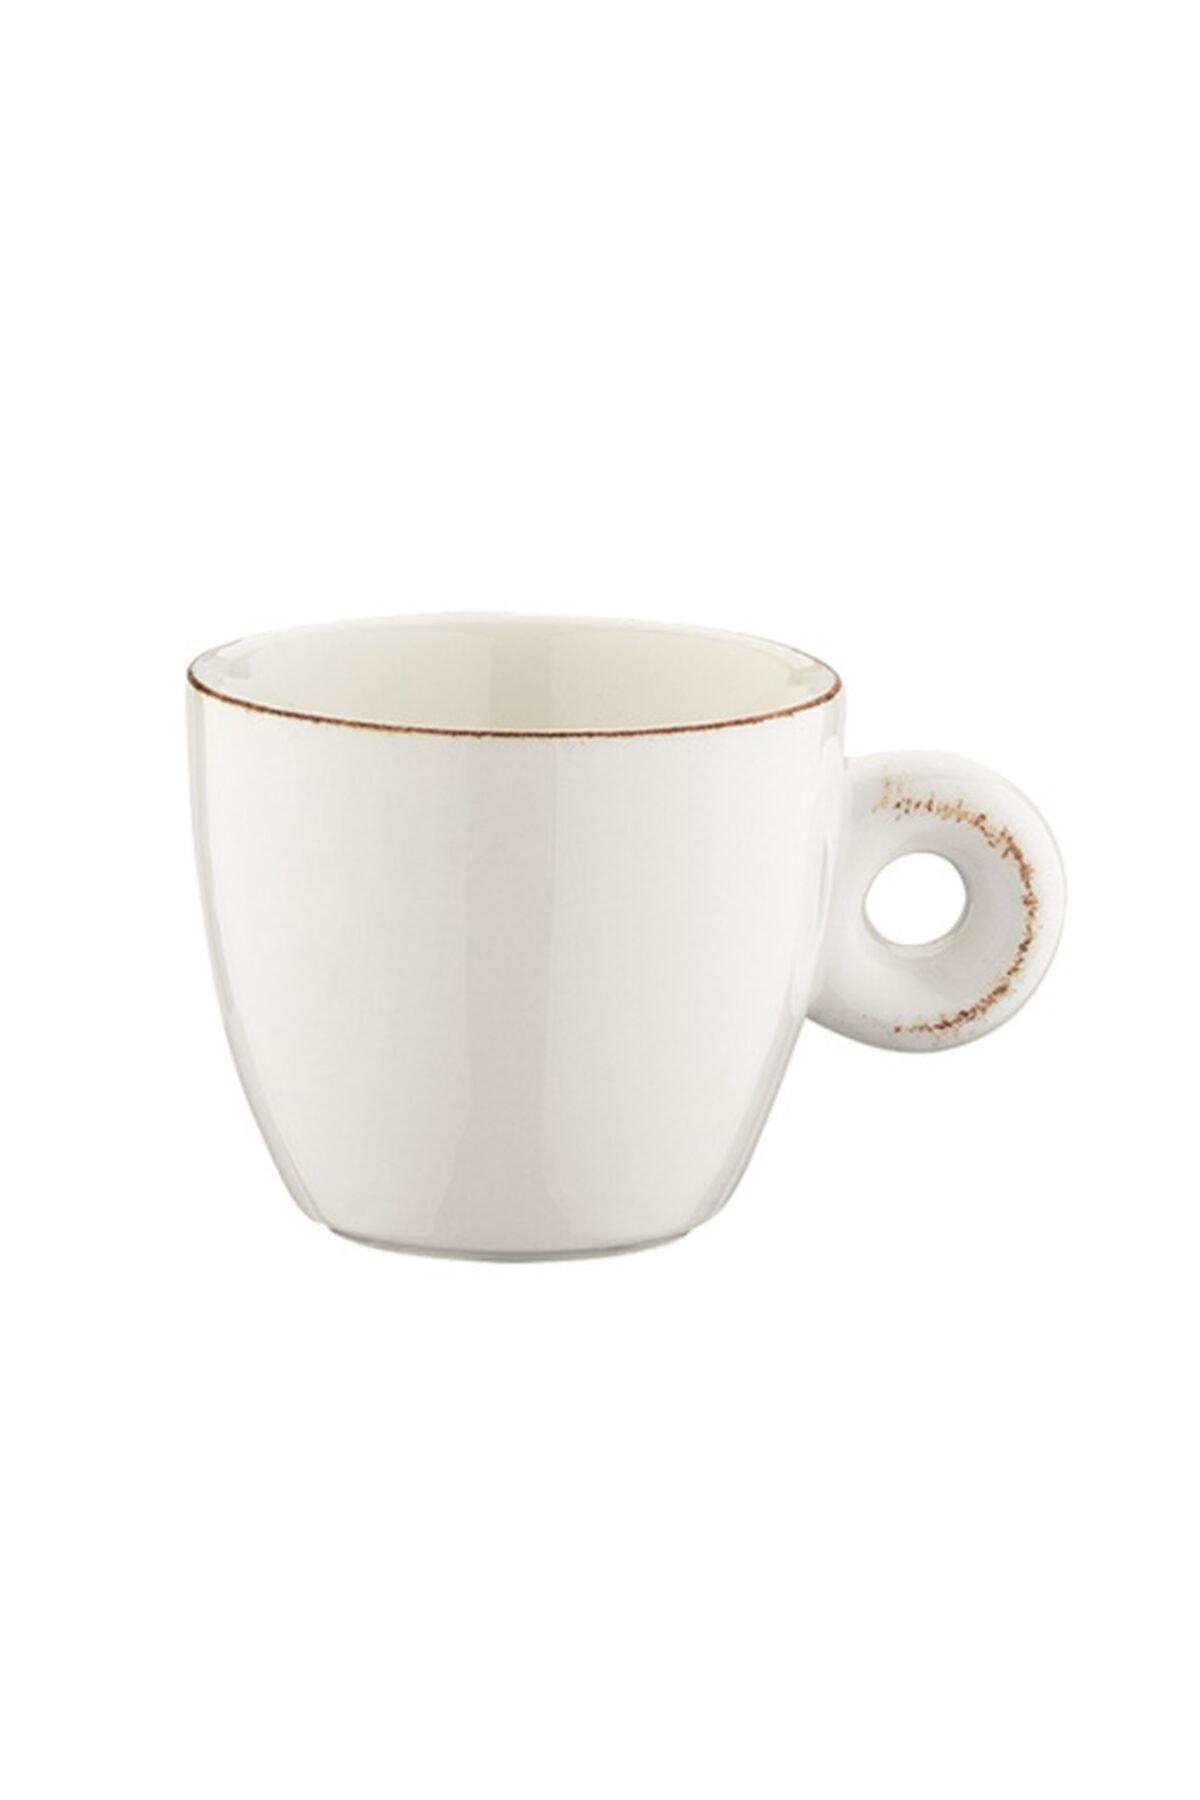 Bonna Porselen Retro Banquet Espresso Fincanı/Tabak 6'lı Takım 1